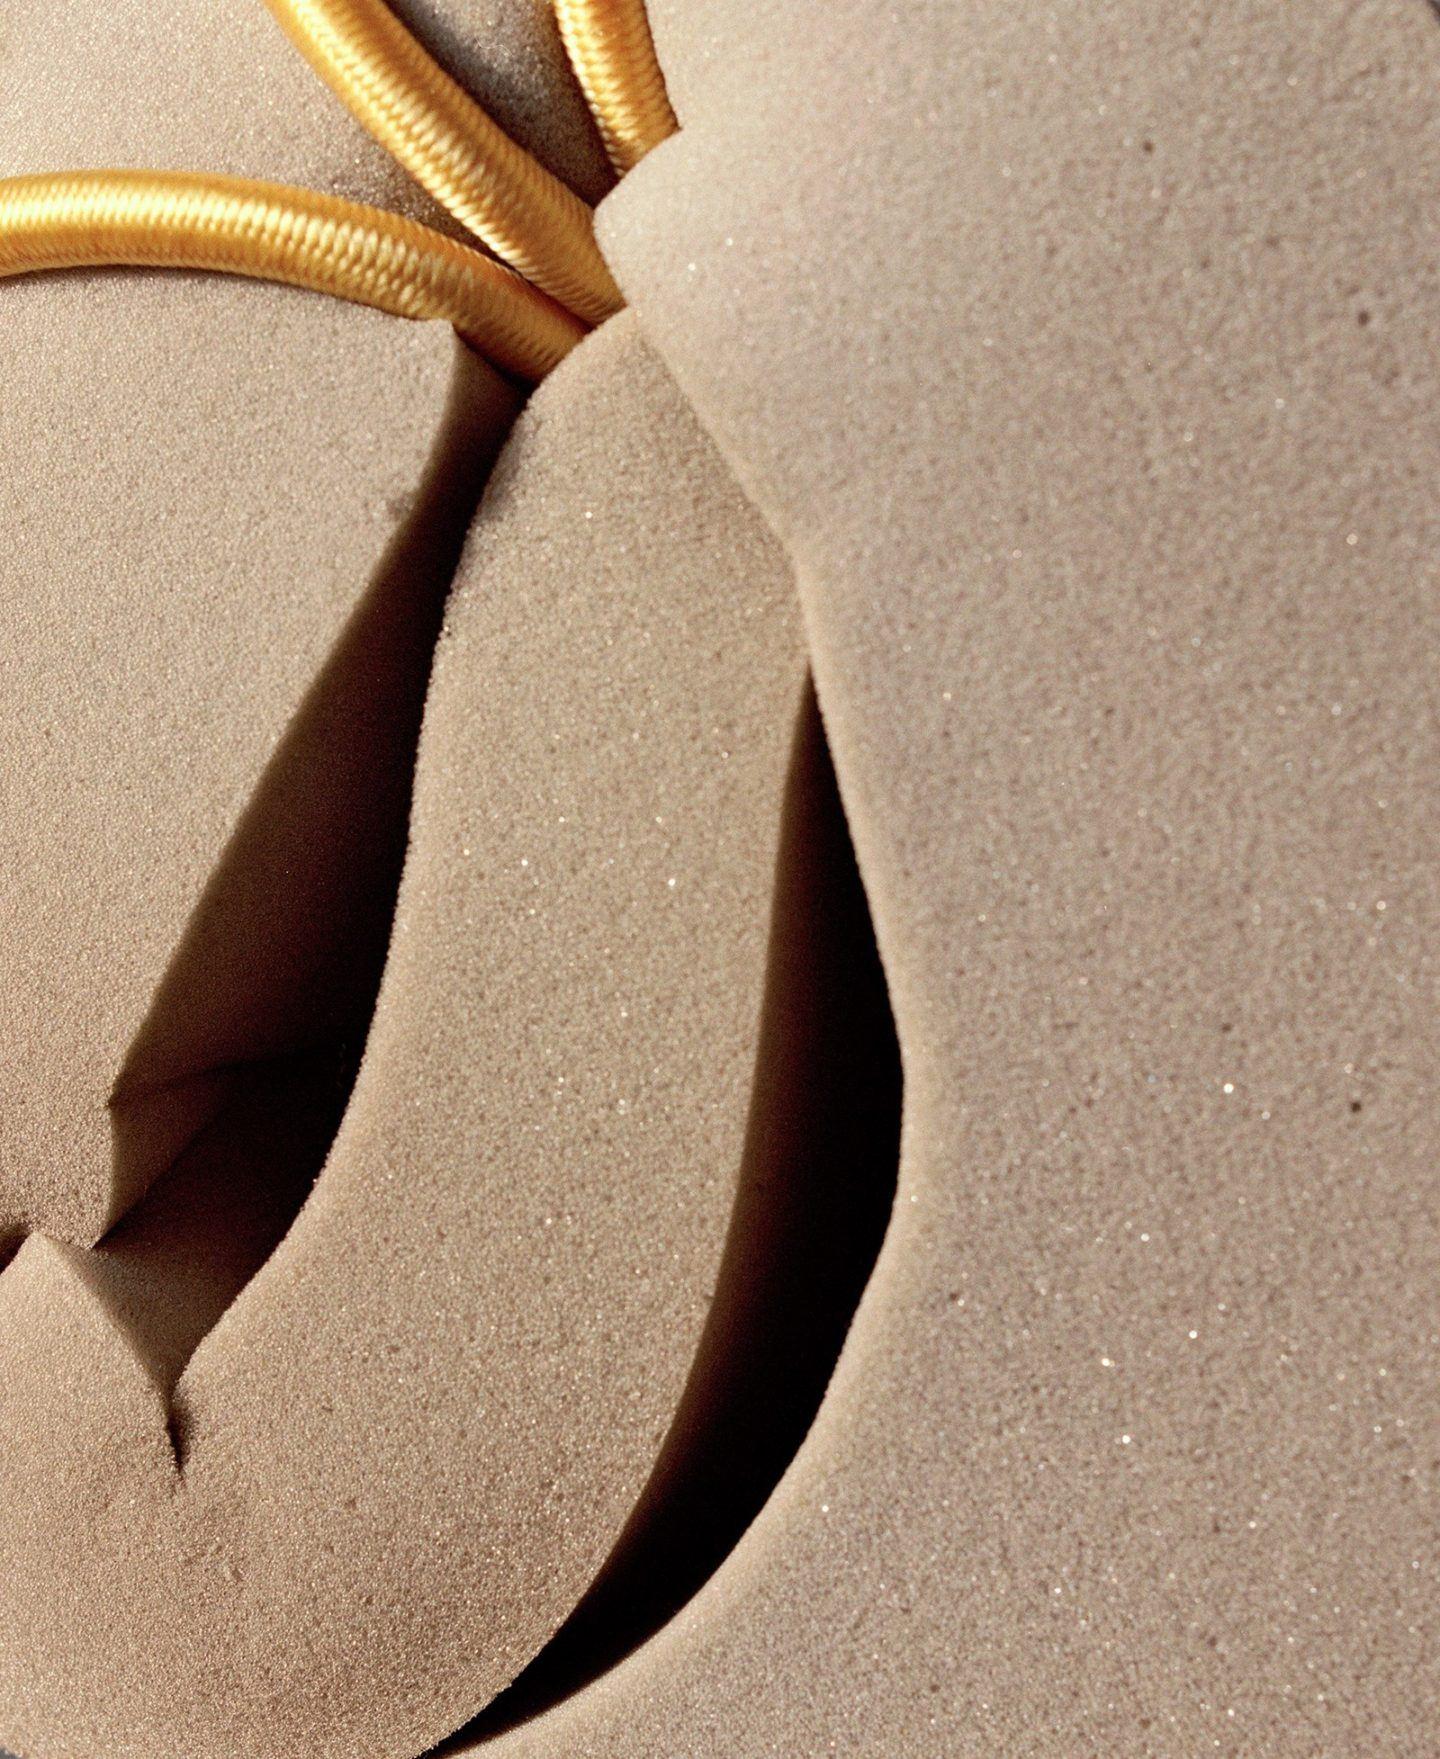 IGNANT-Art-Tine-Bek-Komfort-Skulptur-5